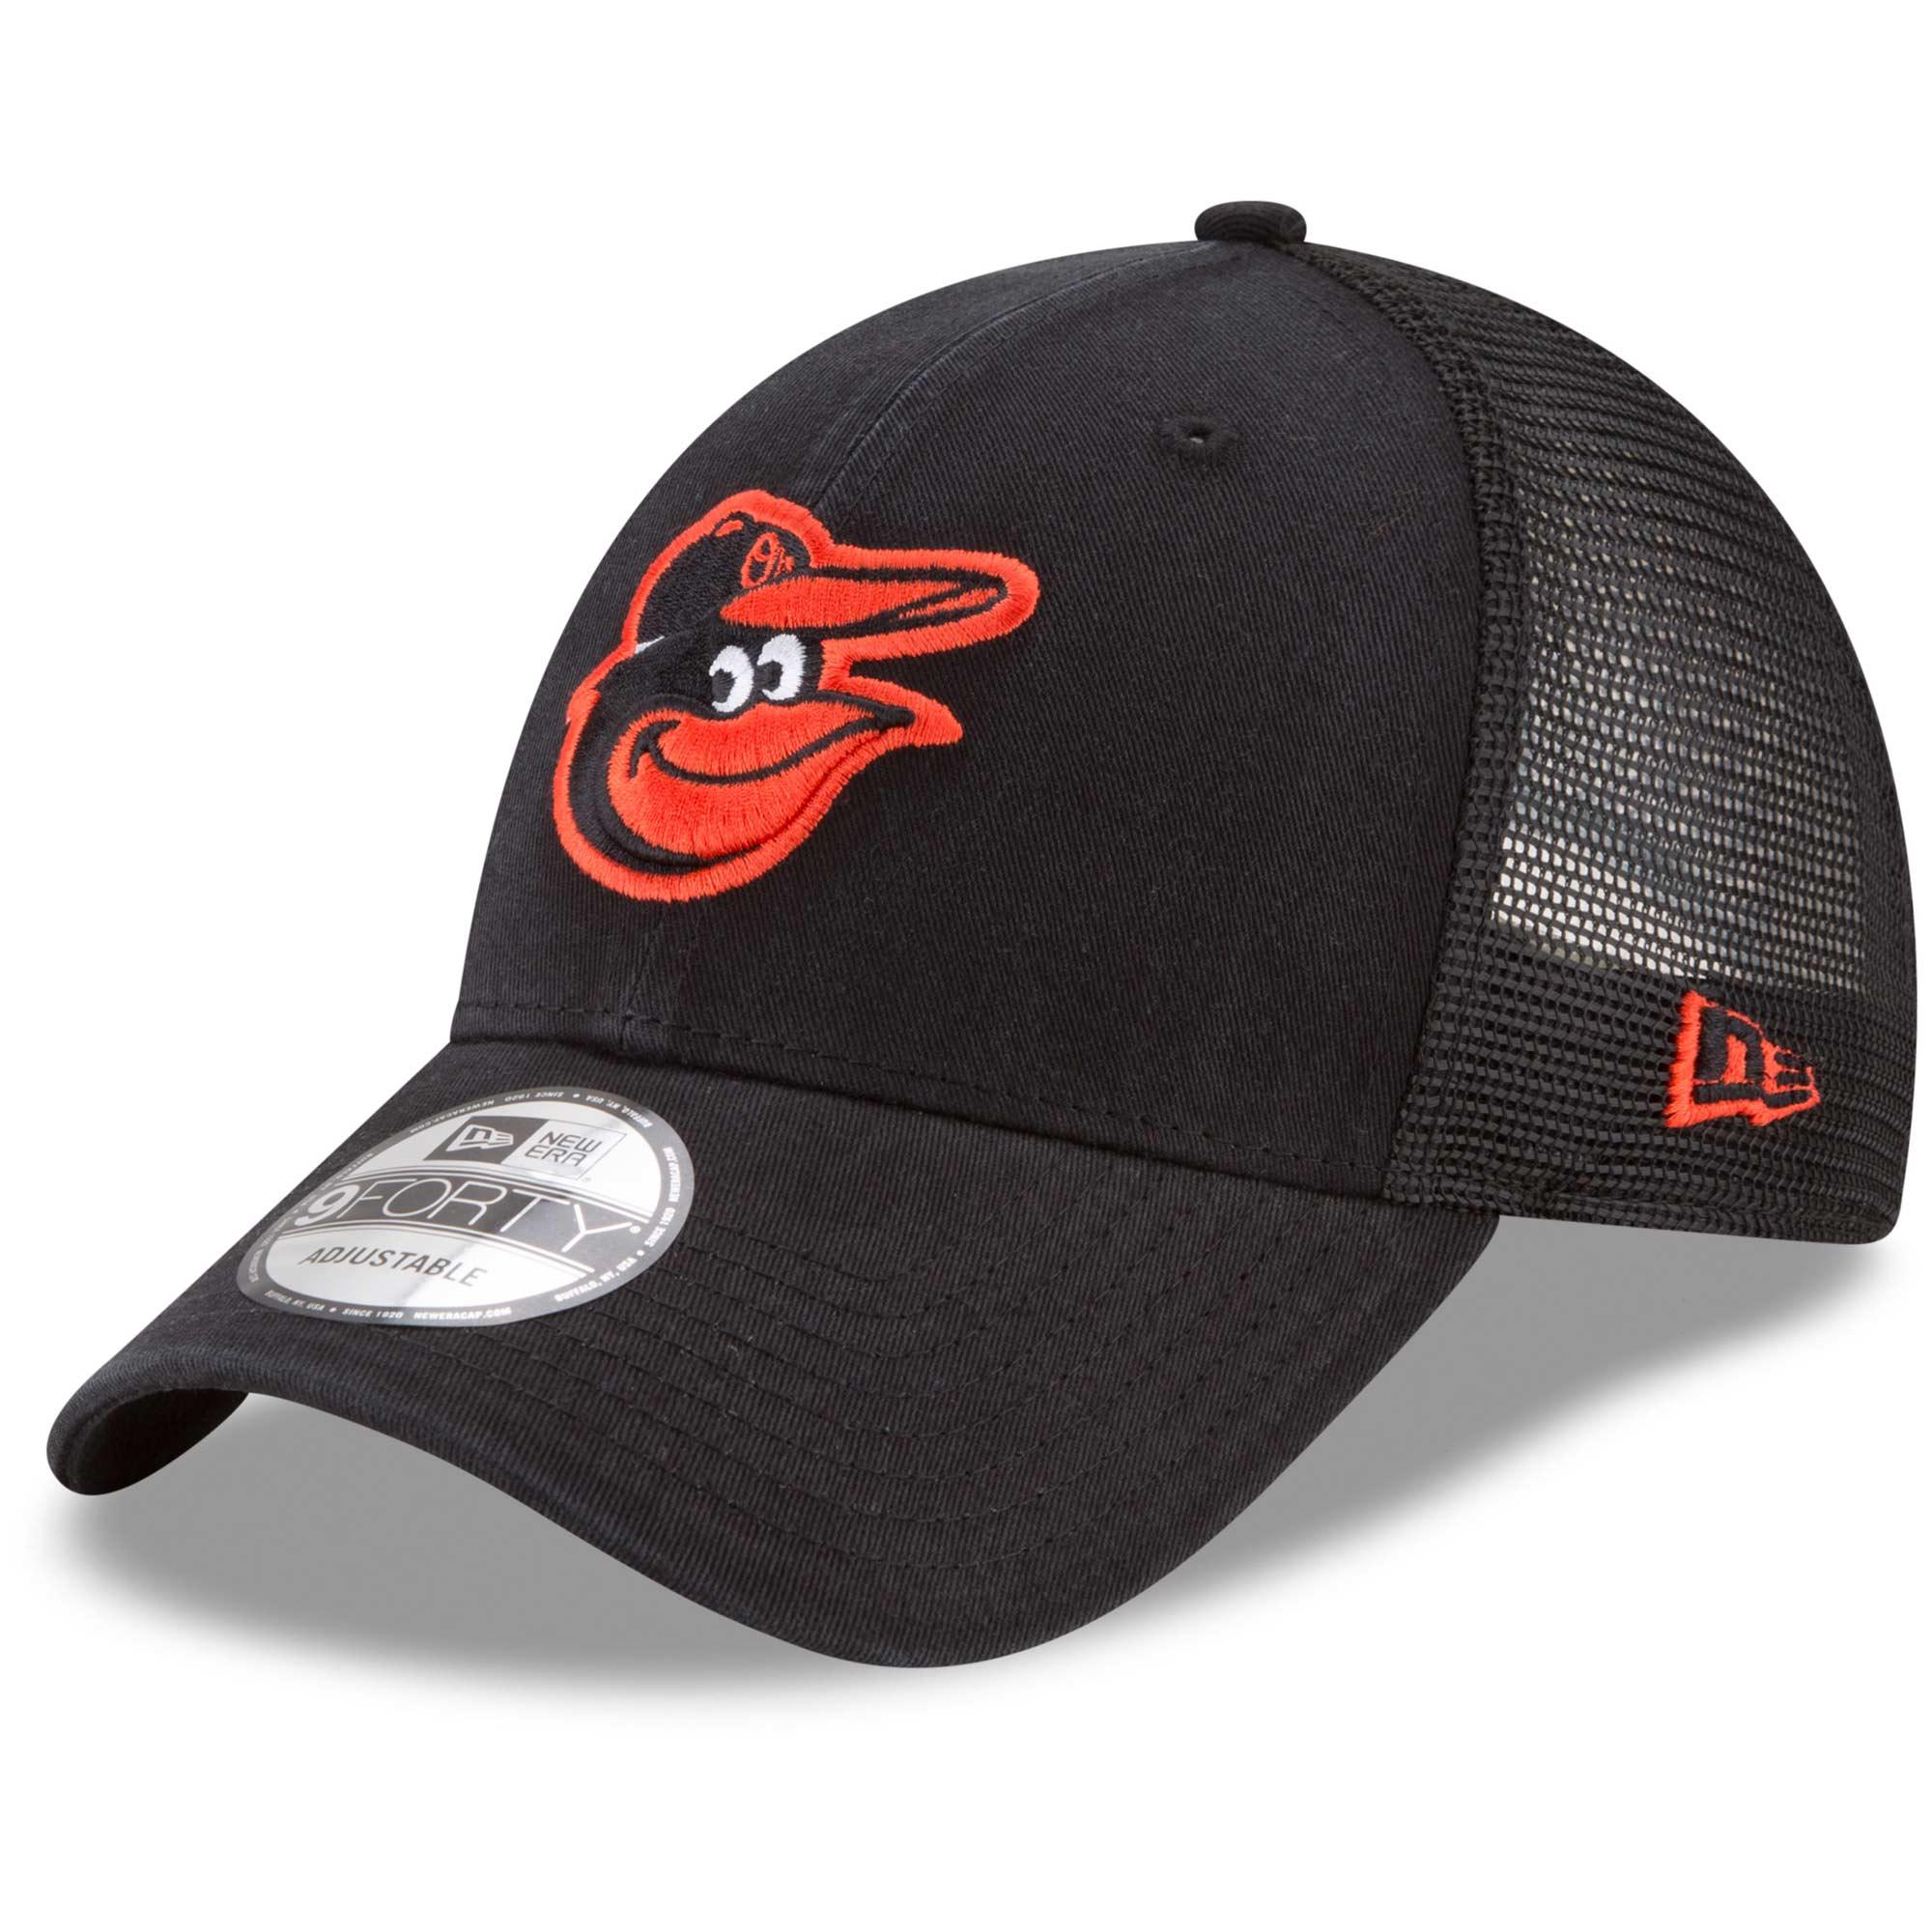 Baltimore Orioles New Era Trucker 9FORTY Adjustable Snapback Hat - Black - OSFA